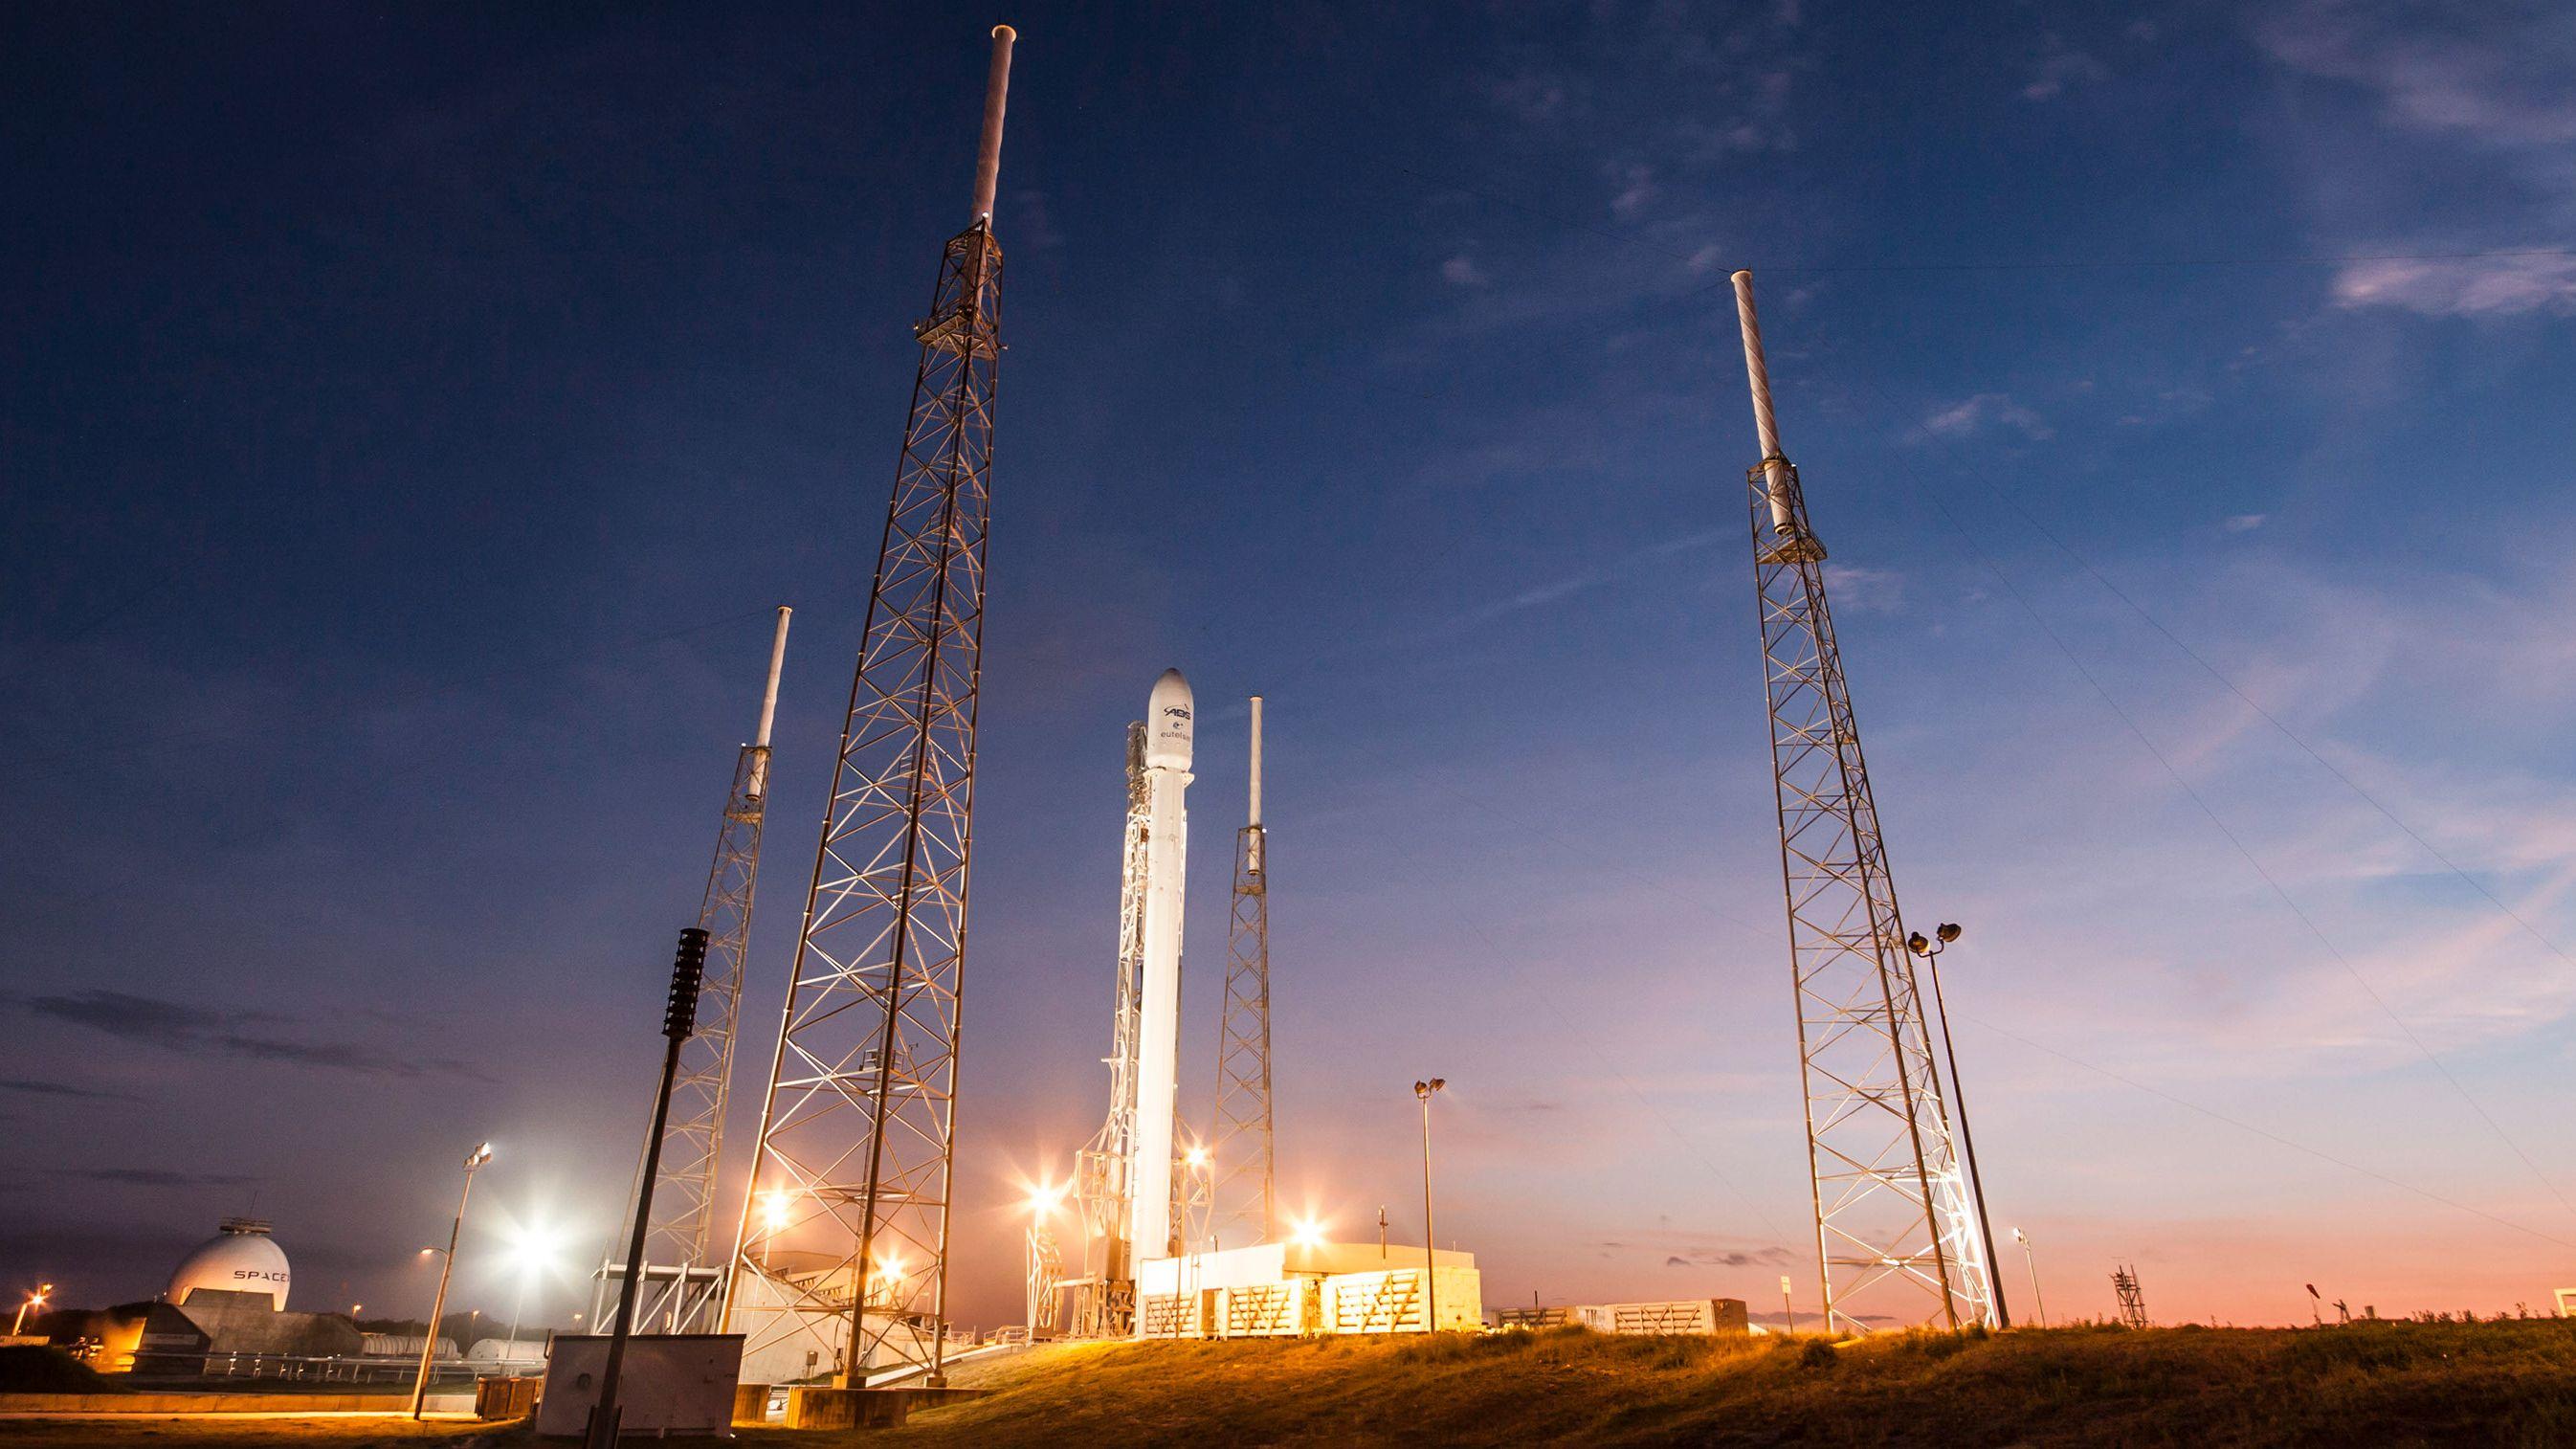 NASA gir SpaceX etterlengtet sertifisering